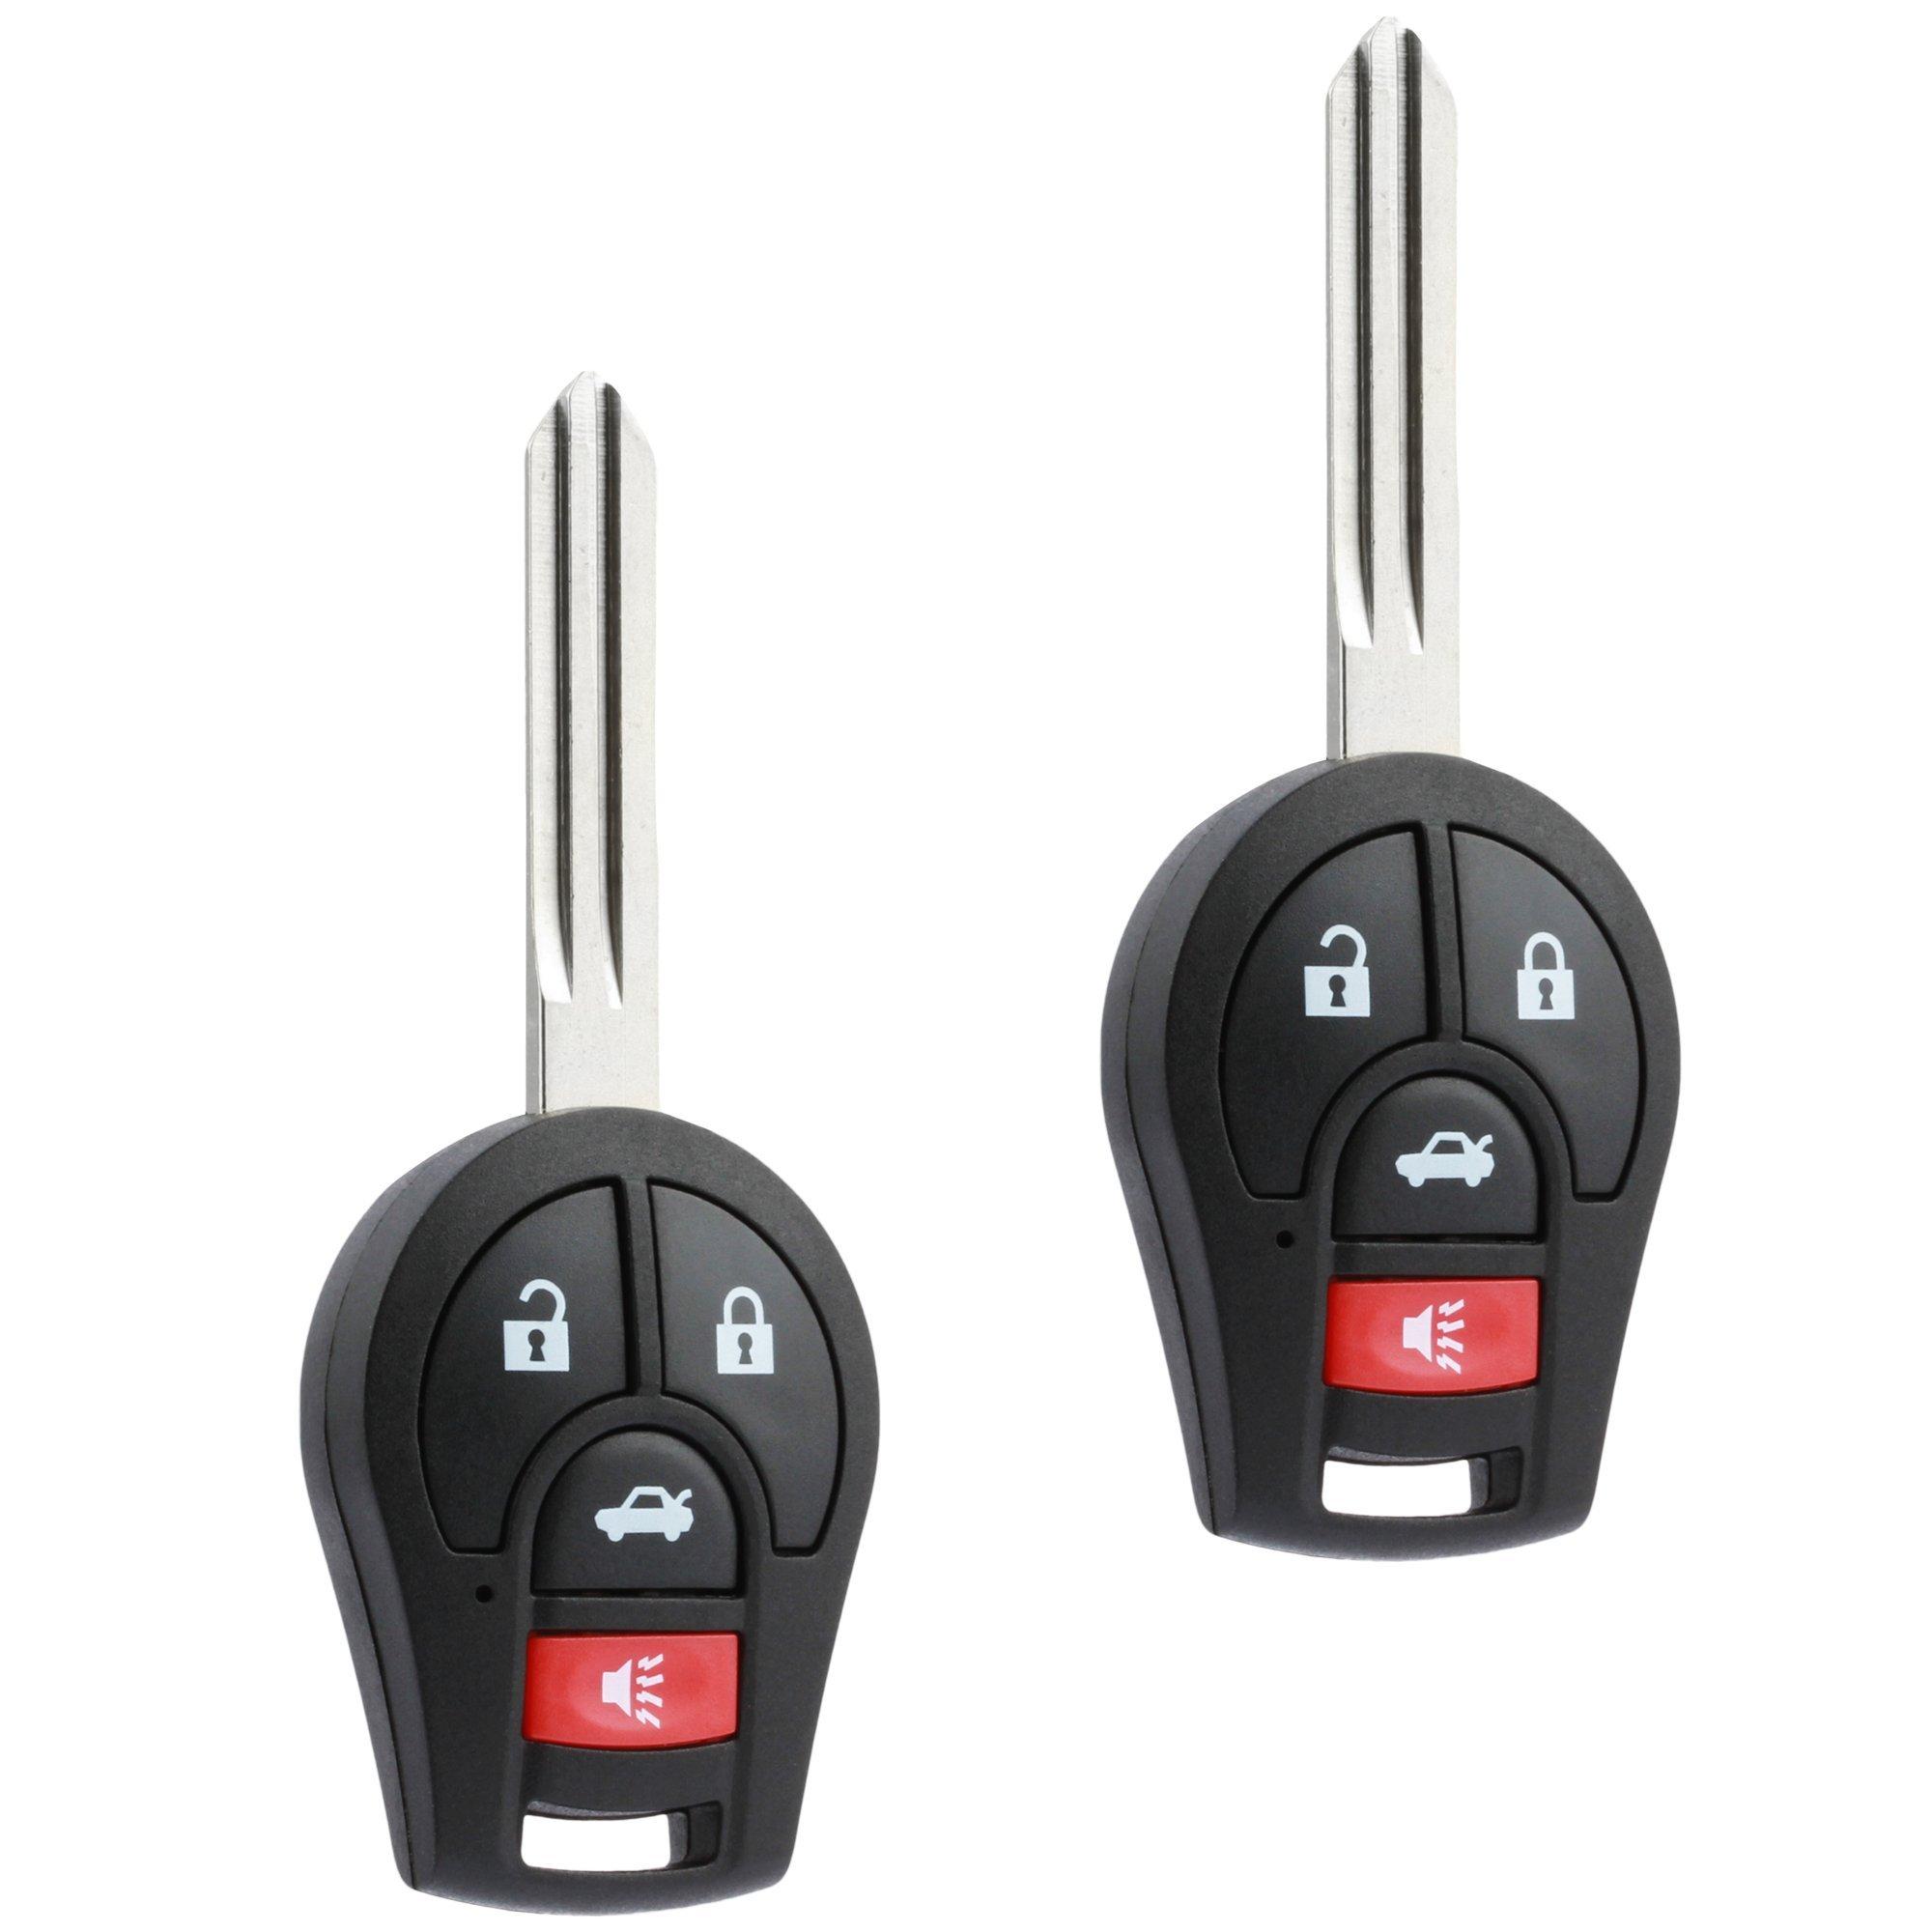 fits 2013 2014 2015 Nissan Sentra Key Fob Keyless Entry Remote (CWTWB1U751),l Set of 2 by USARemote